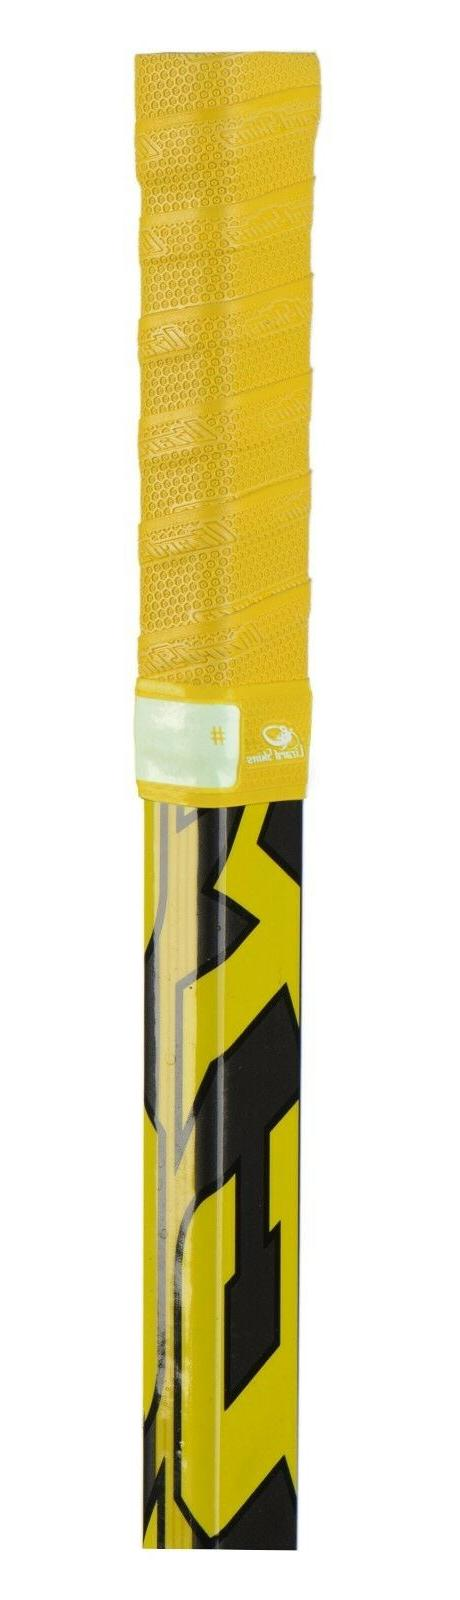 Lizard Skins Hockey Stick Grip Tape Colors